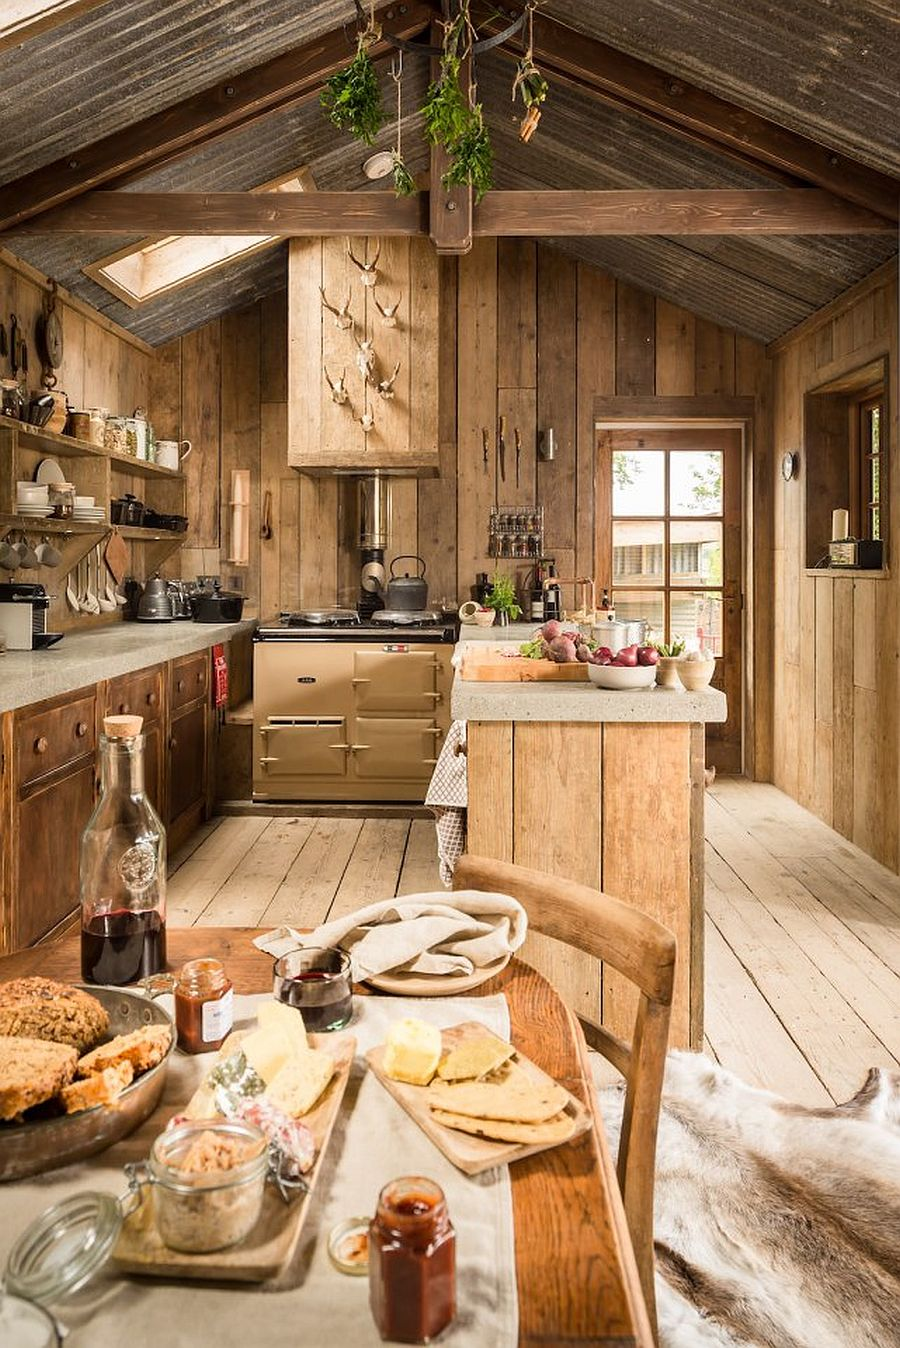 adelaparvu.com despre cabana rustica si tuse industriale, Firefly Cabin, Cornwall, Anglia, Foto Unique Home Stays (17)